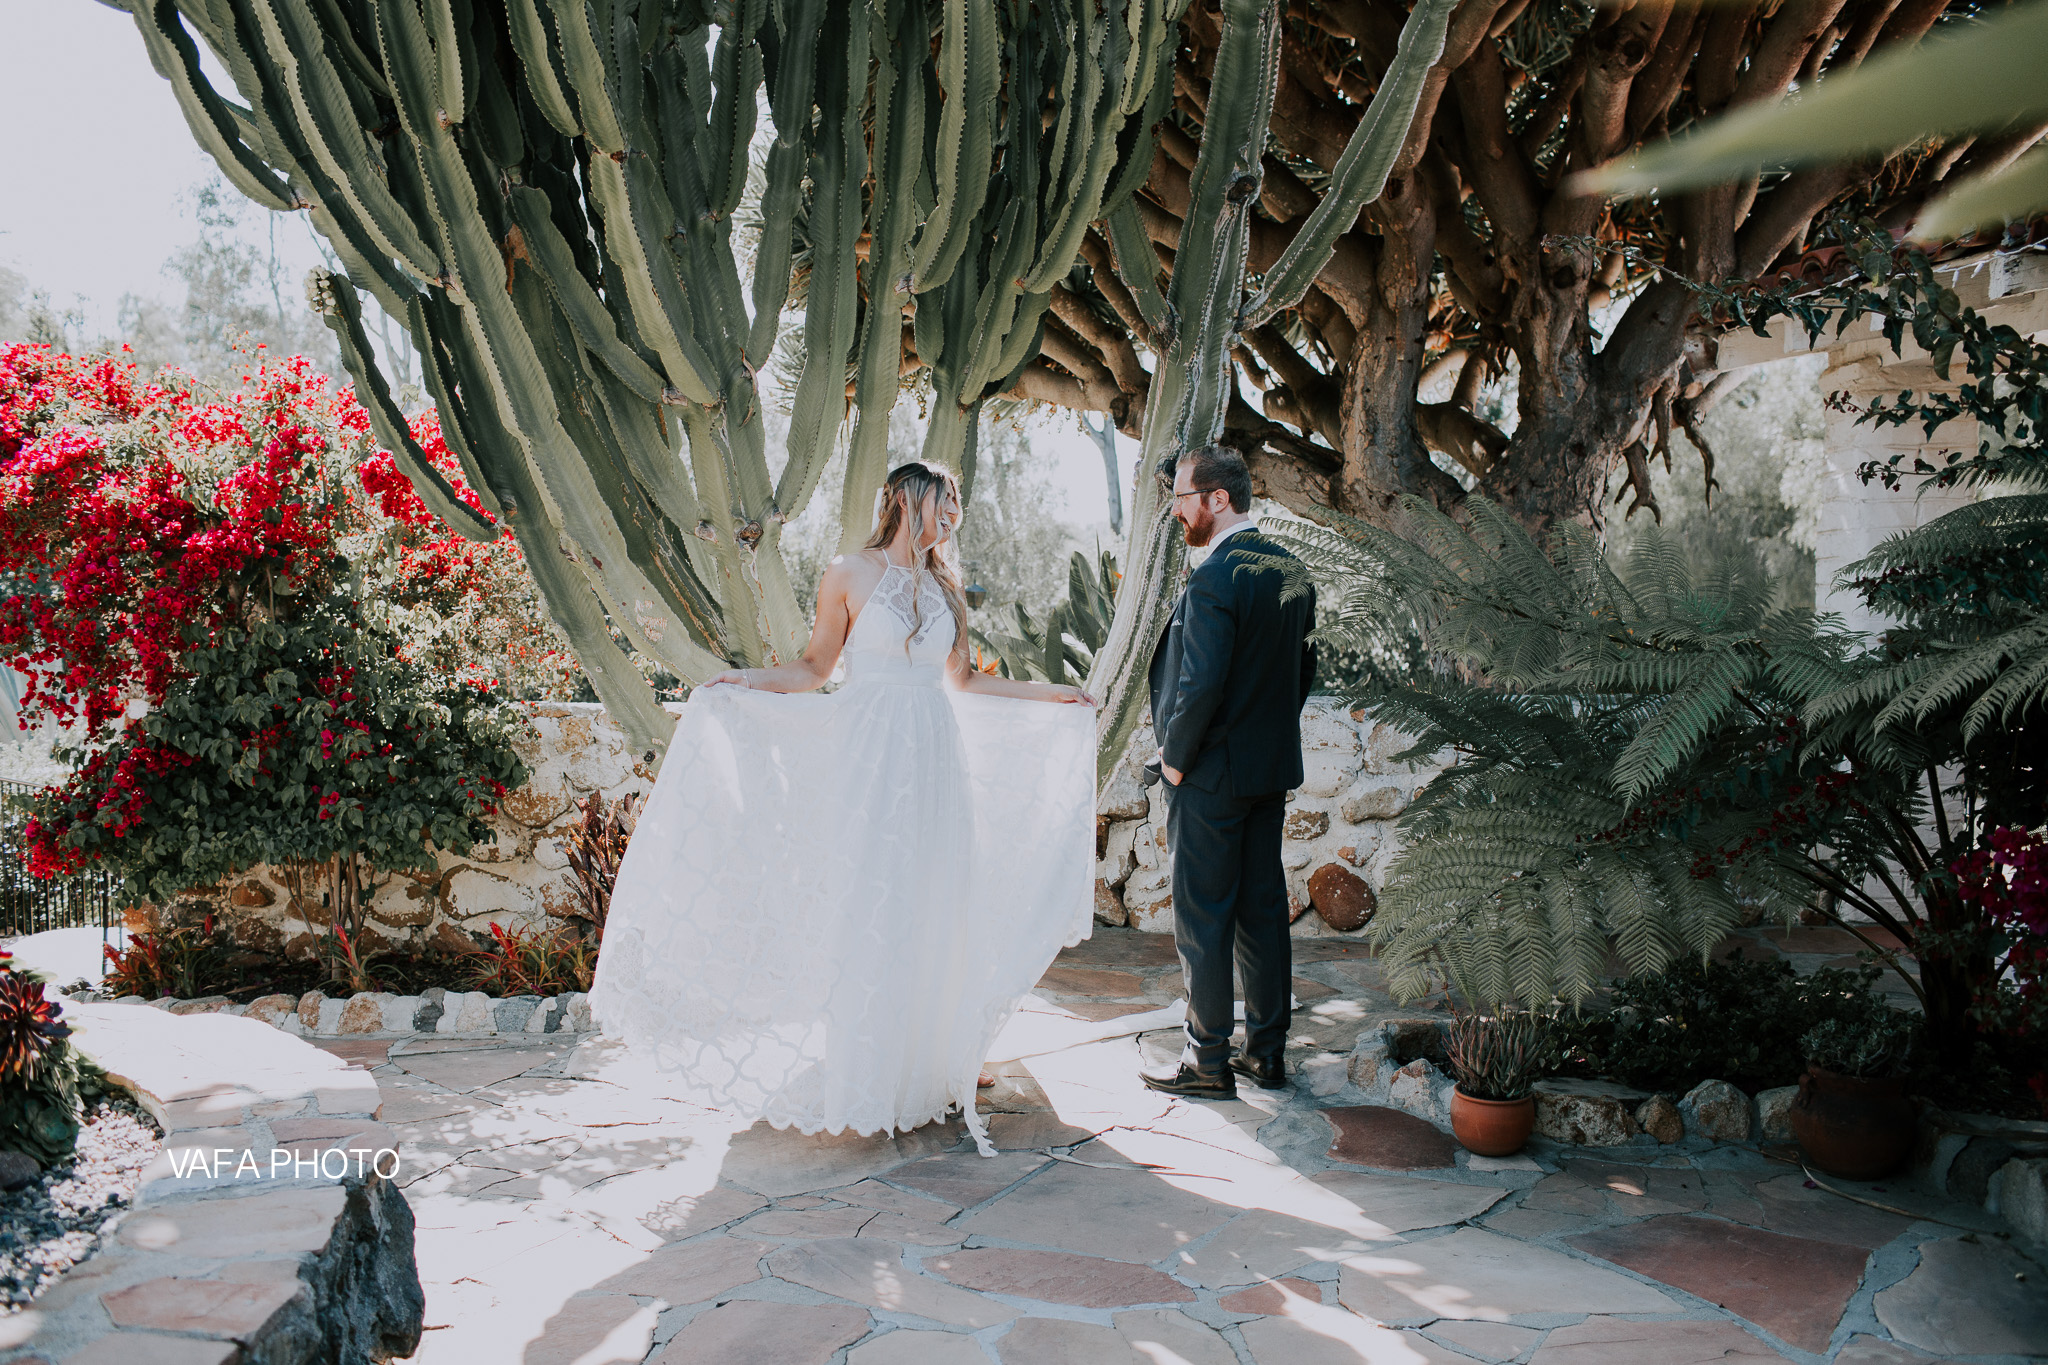 Leo-Carrillo-Ranch-Wedding-Lauren-Mike-Vafa-Photo-287.jpg